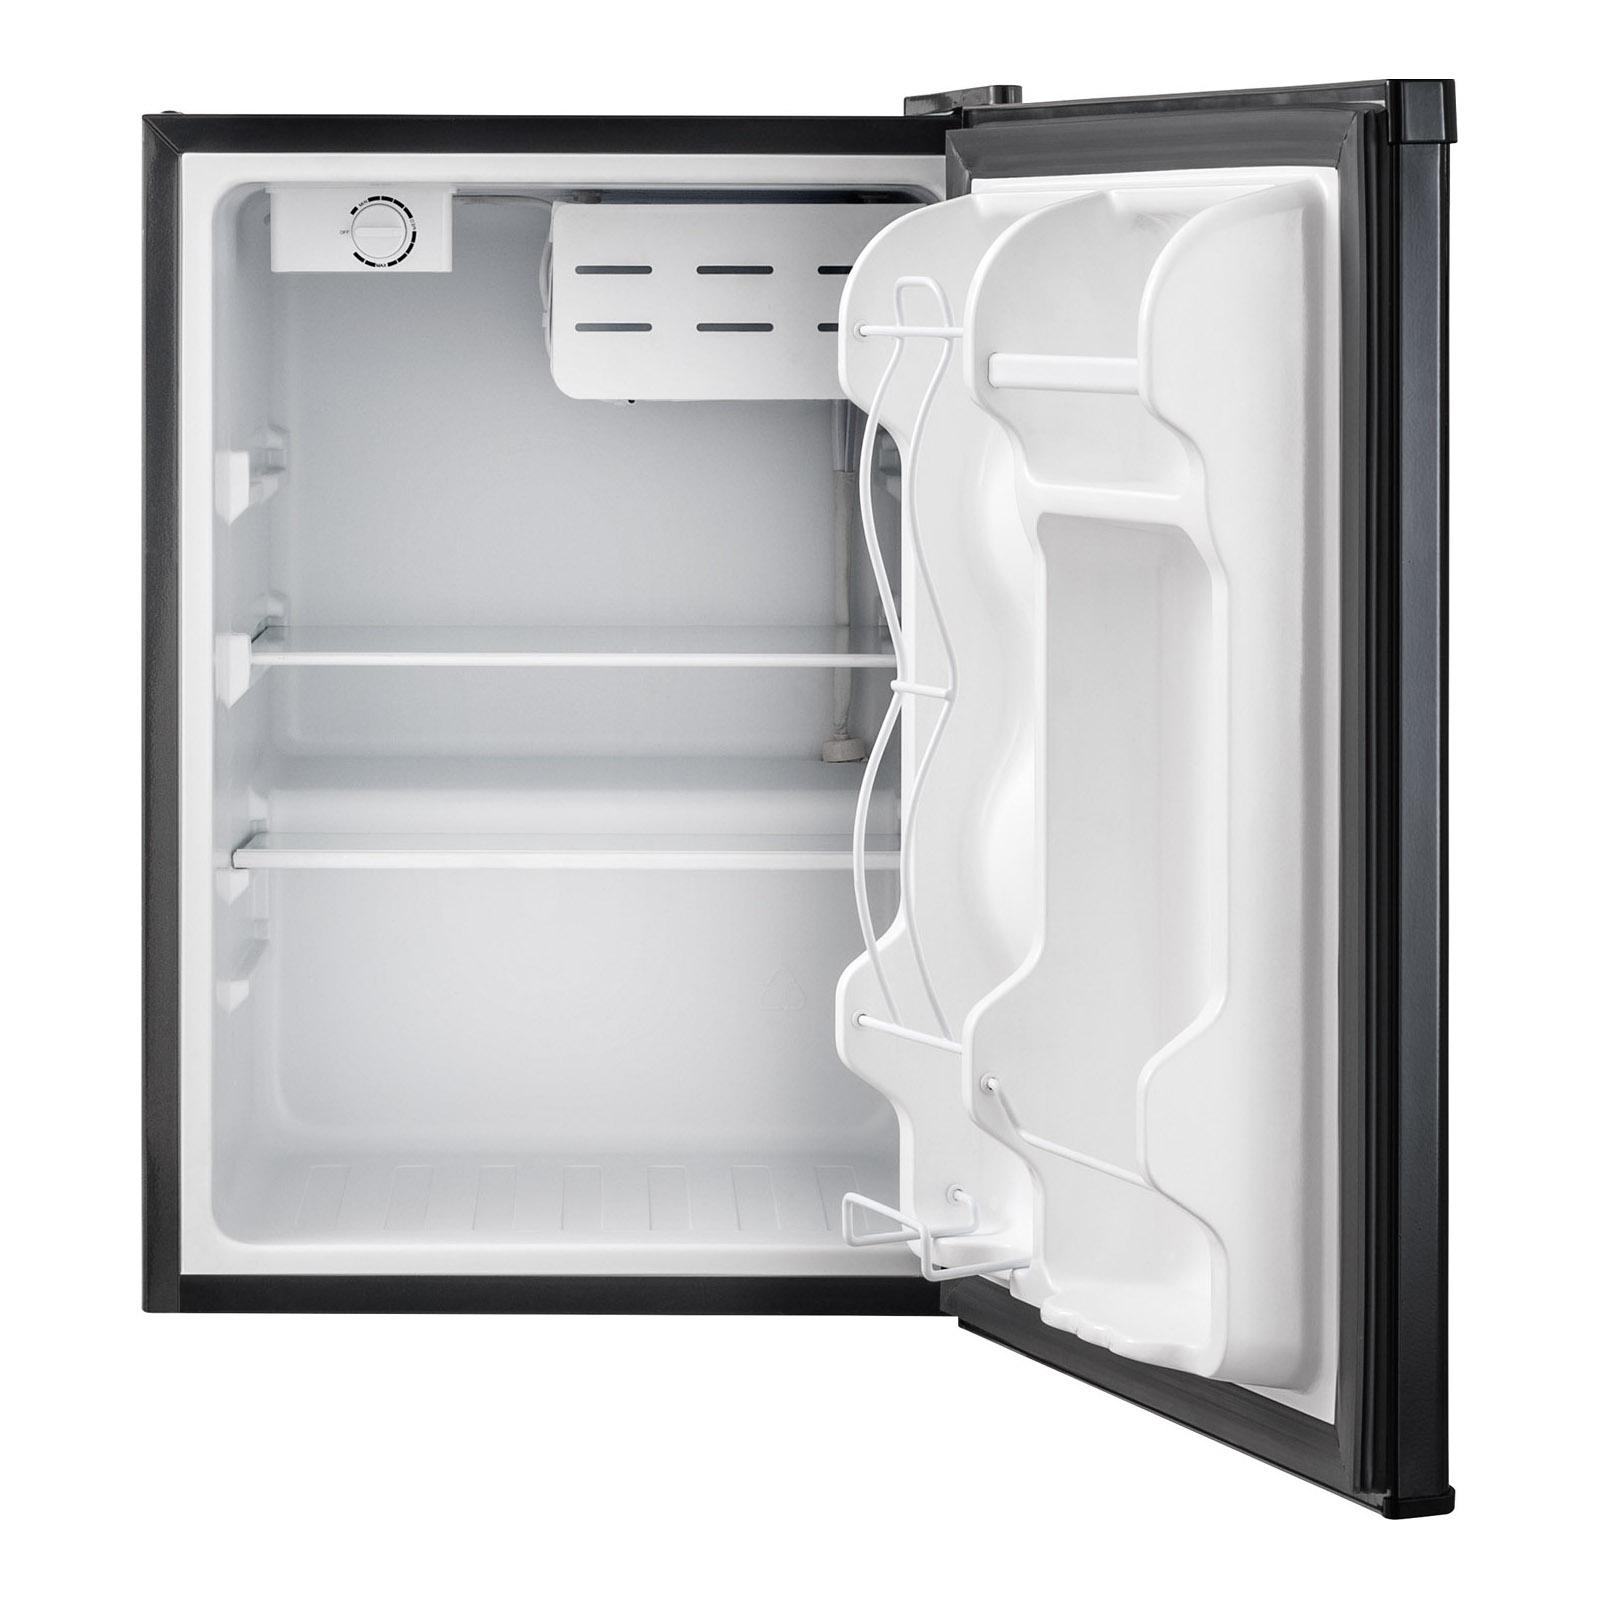 Frigidaire FFPE2411QB 2.4 cu. ft. Compact Refrigerator - Black